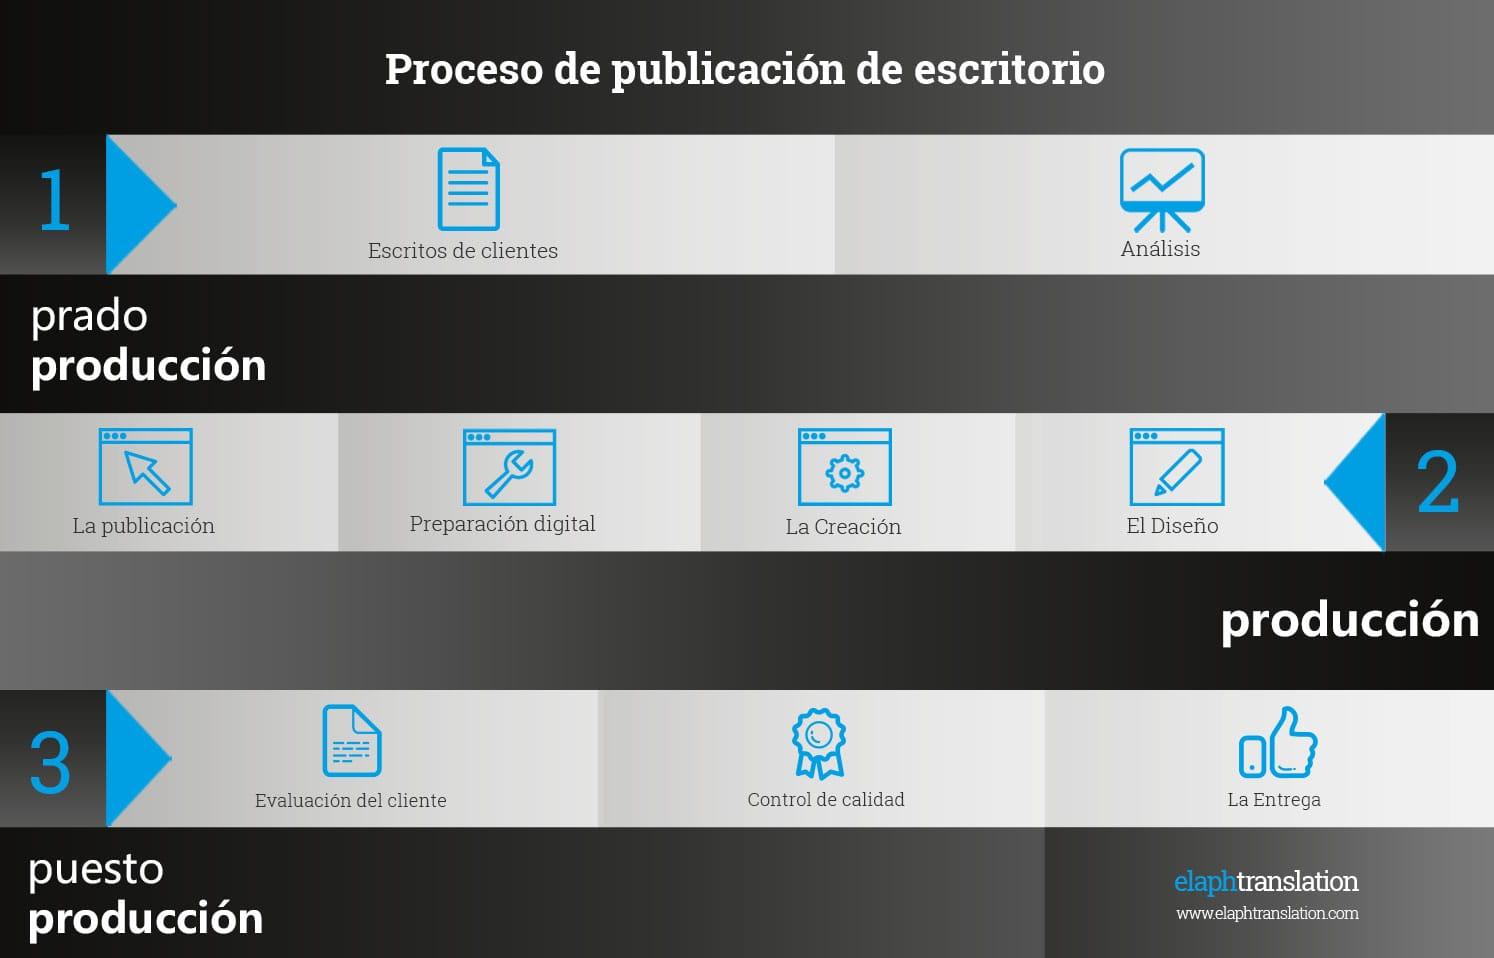 desktop publishing process ES